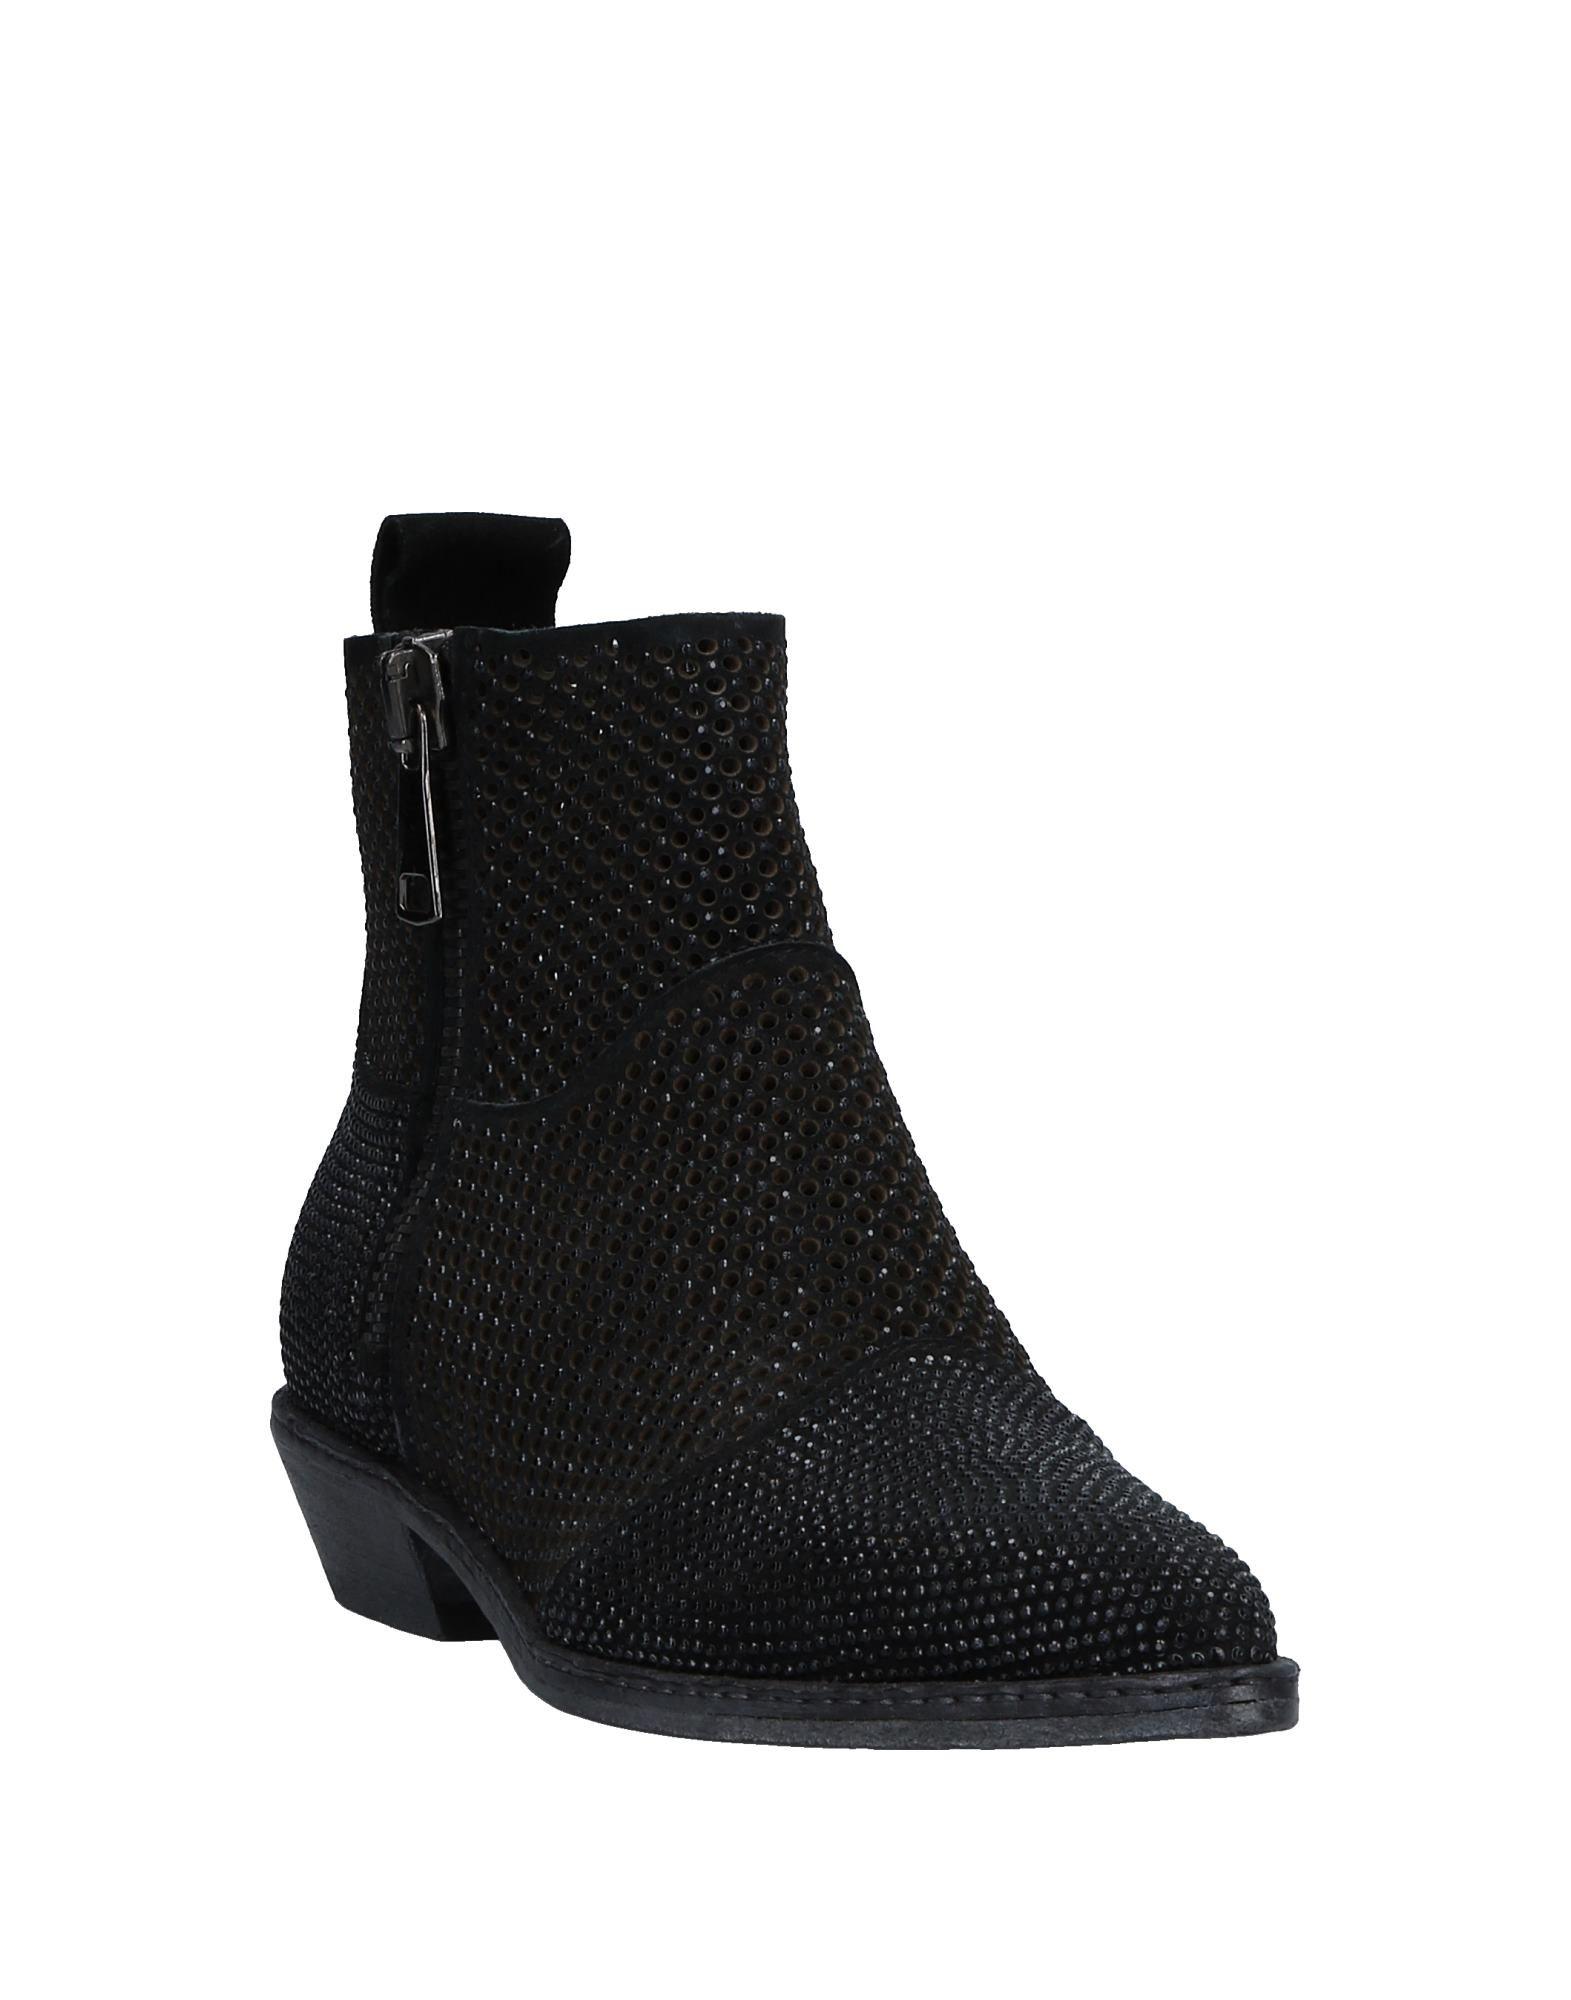 Fru.It Fru.It Fru.It Ankle Boot - Women Fru.It Ankle Boots online on  United Kingdom - 11534223XM 5908e0